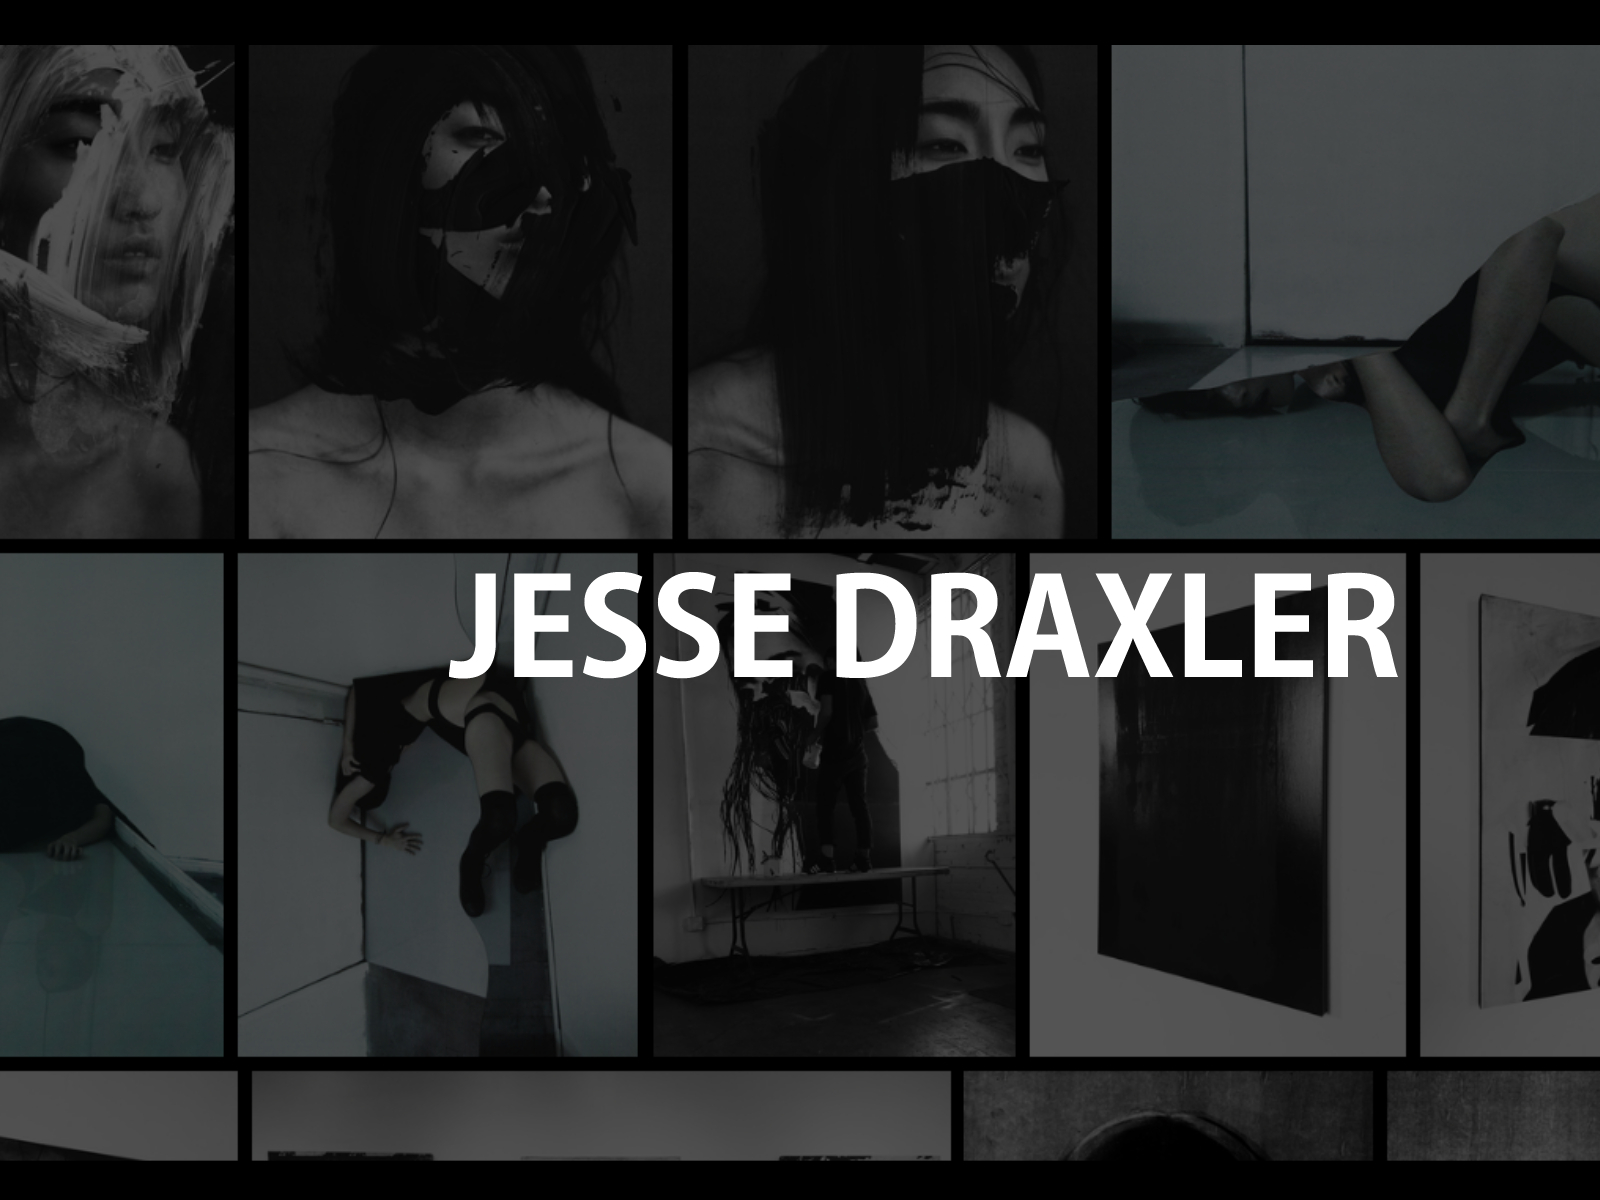 JESSE DRAXLER